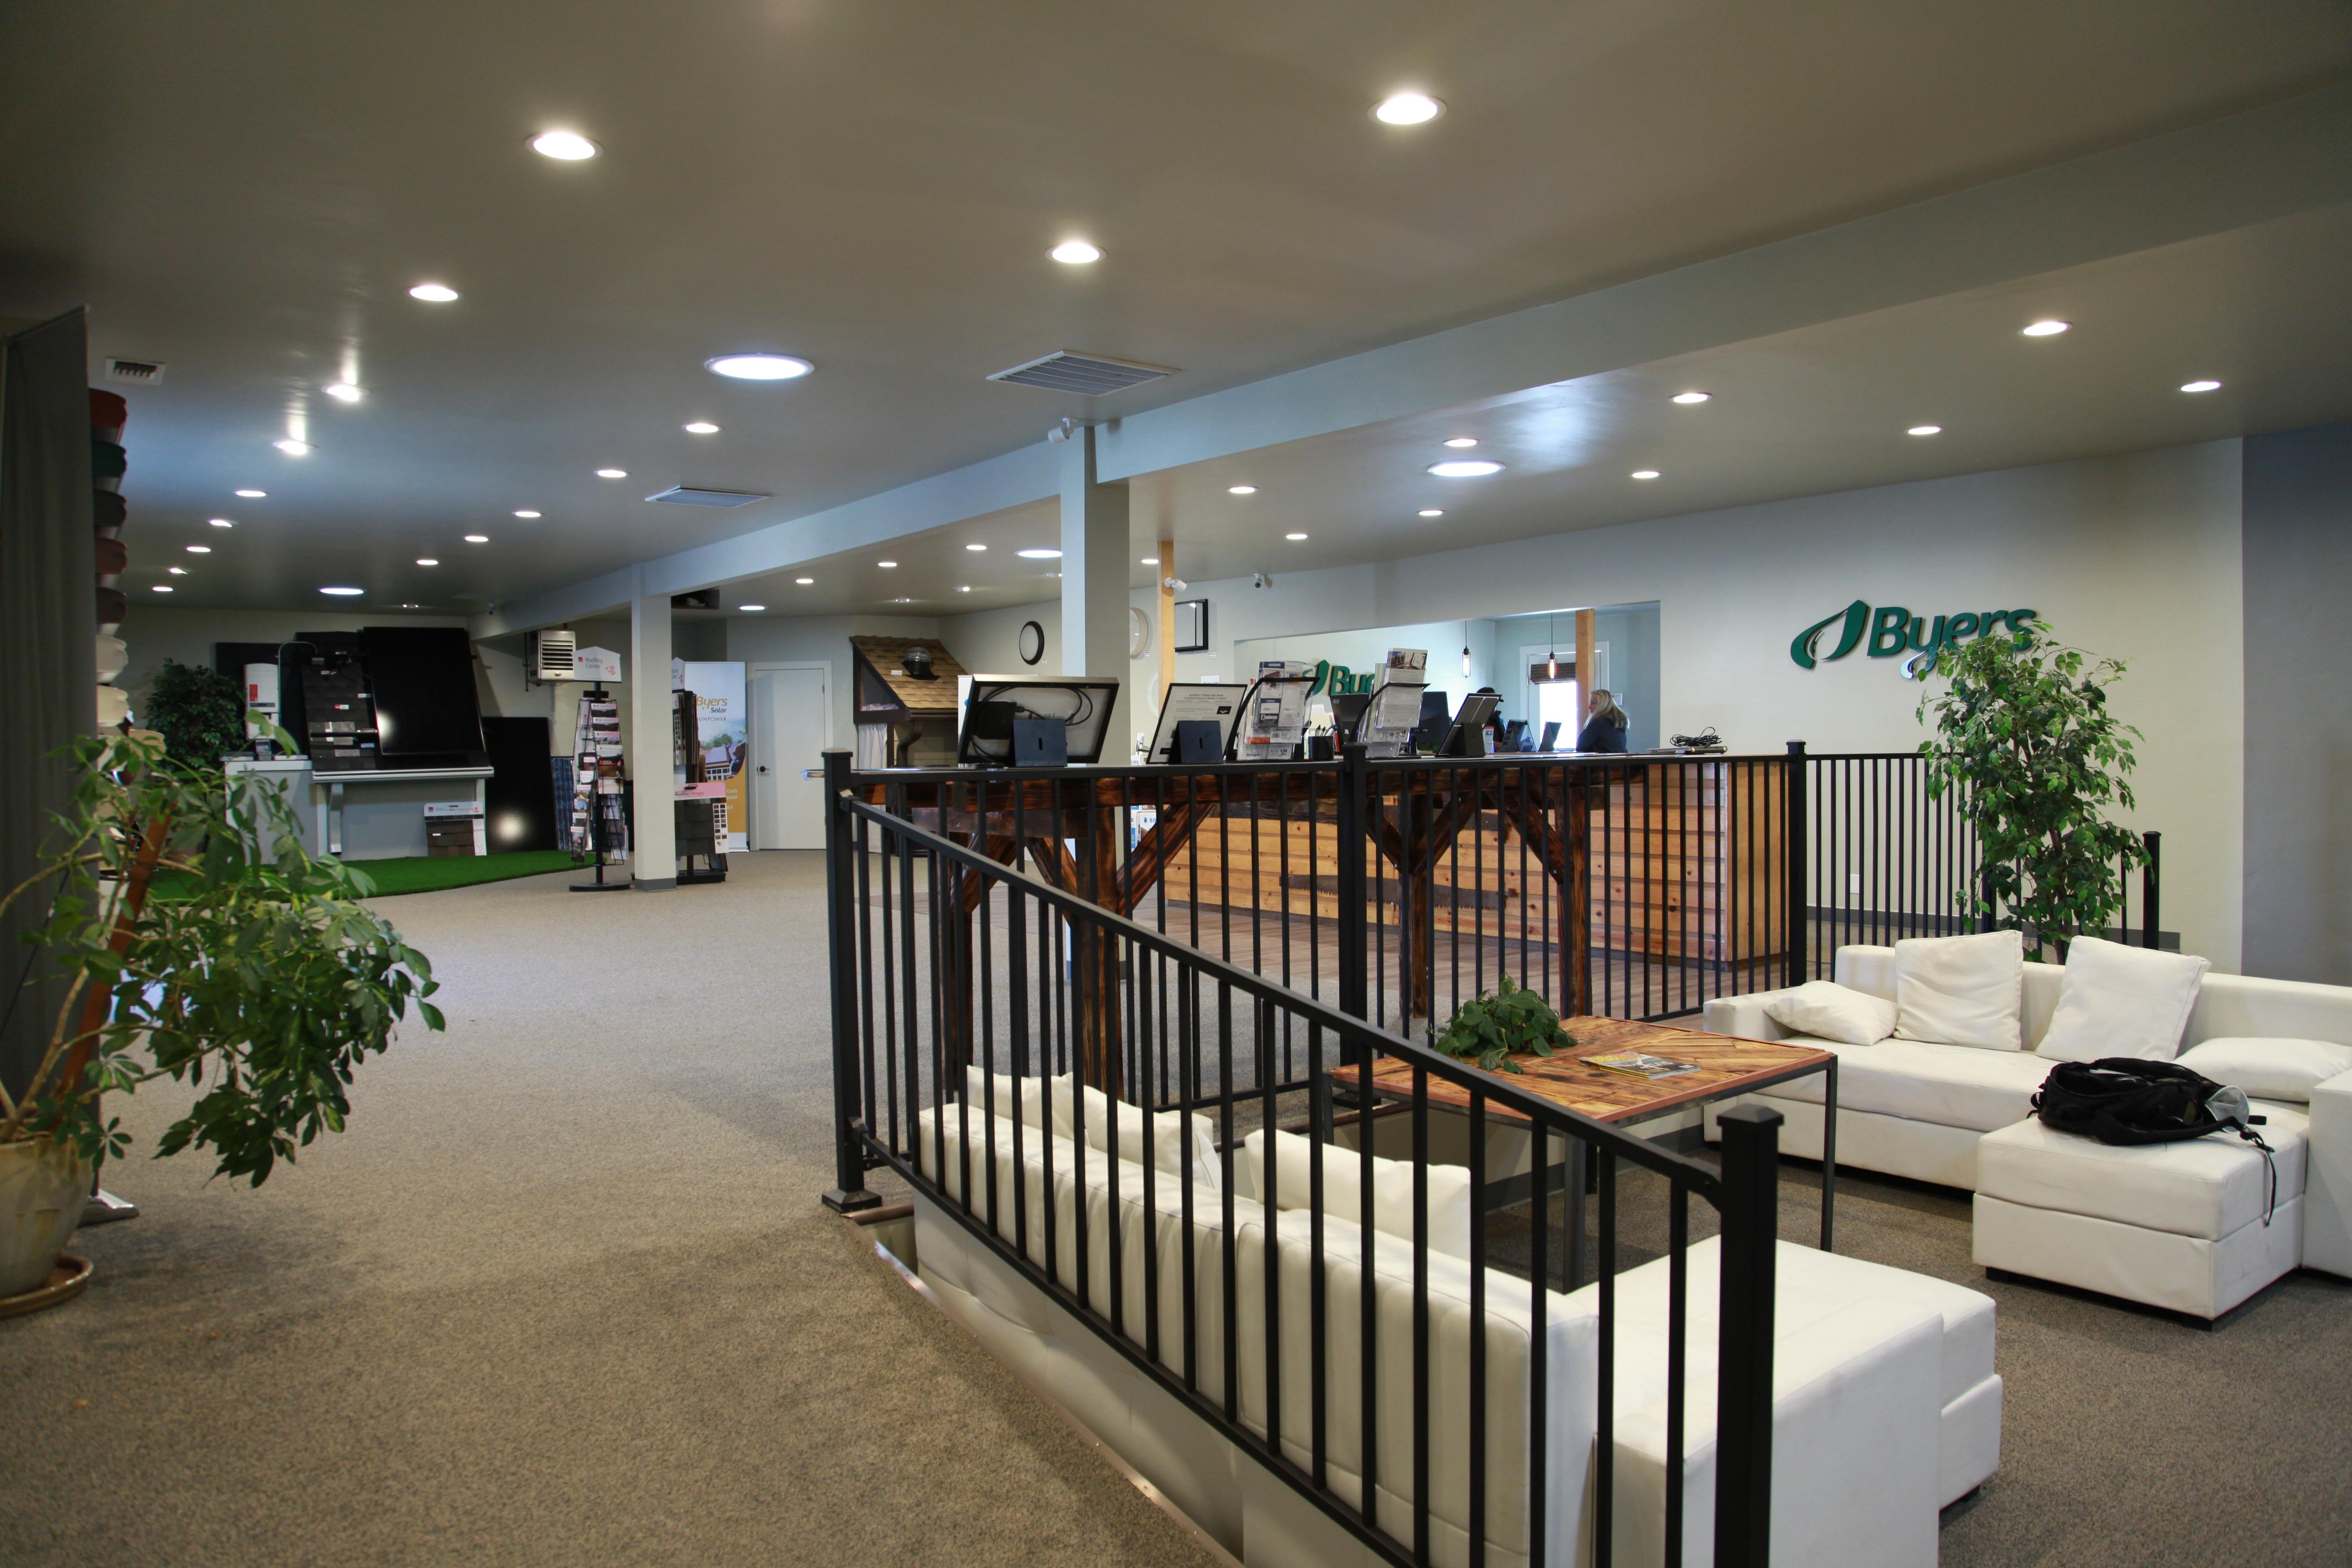 Byers Design Center - 115 Idaho Maryland Road - Grass Valley